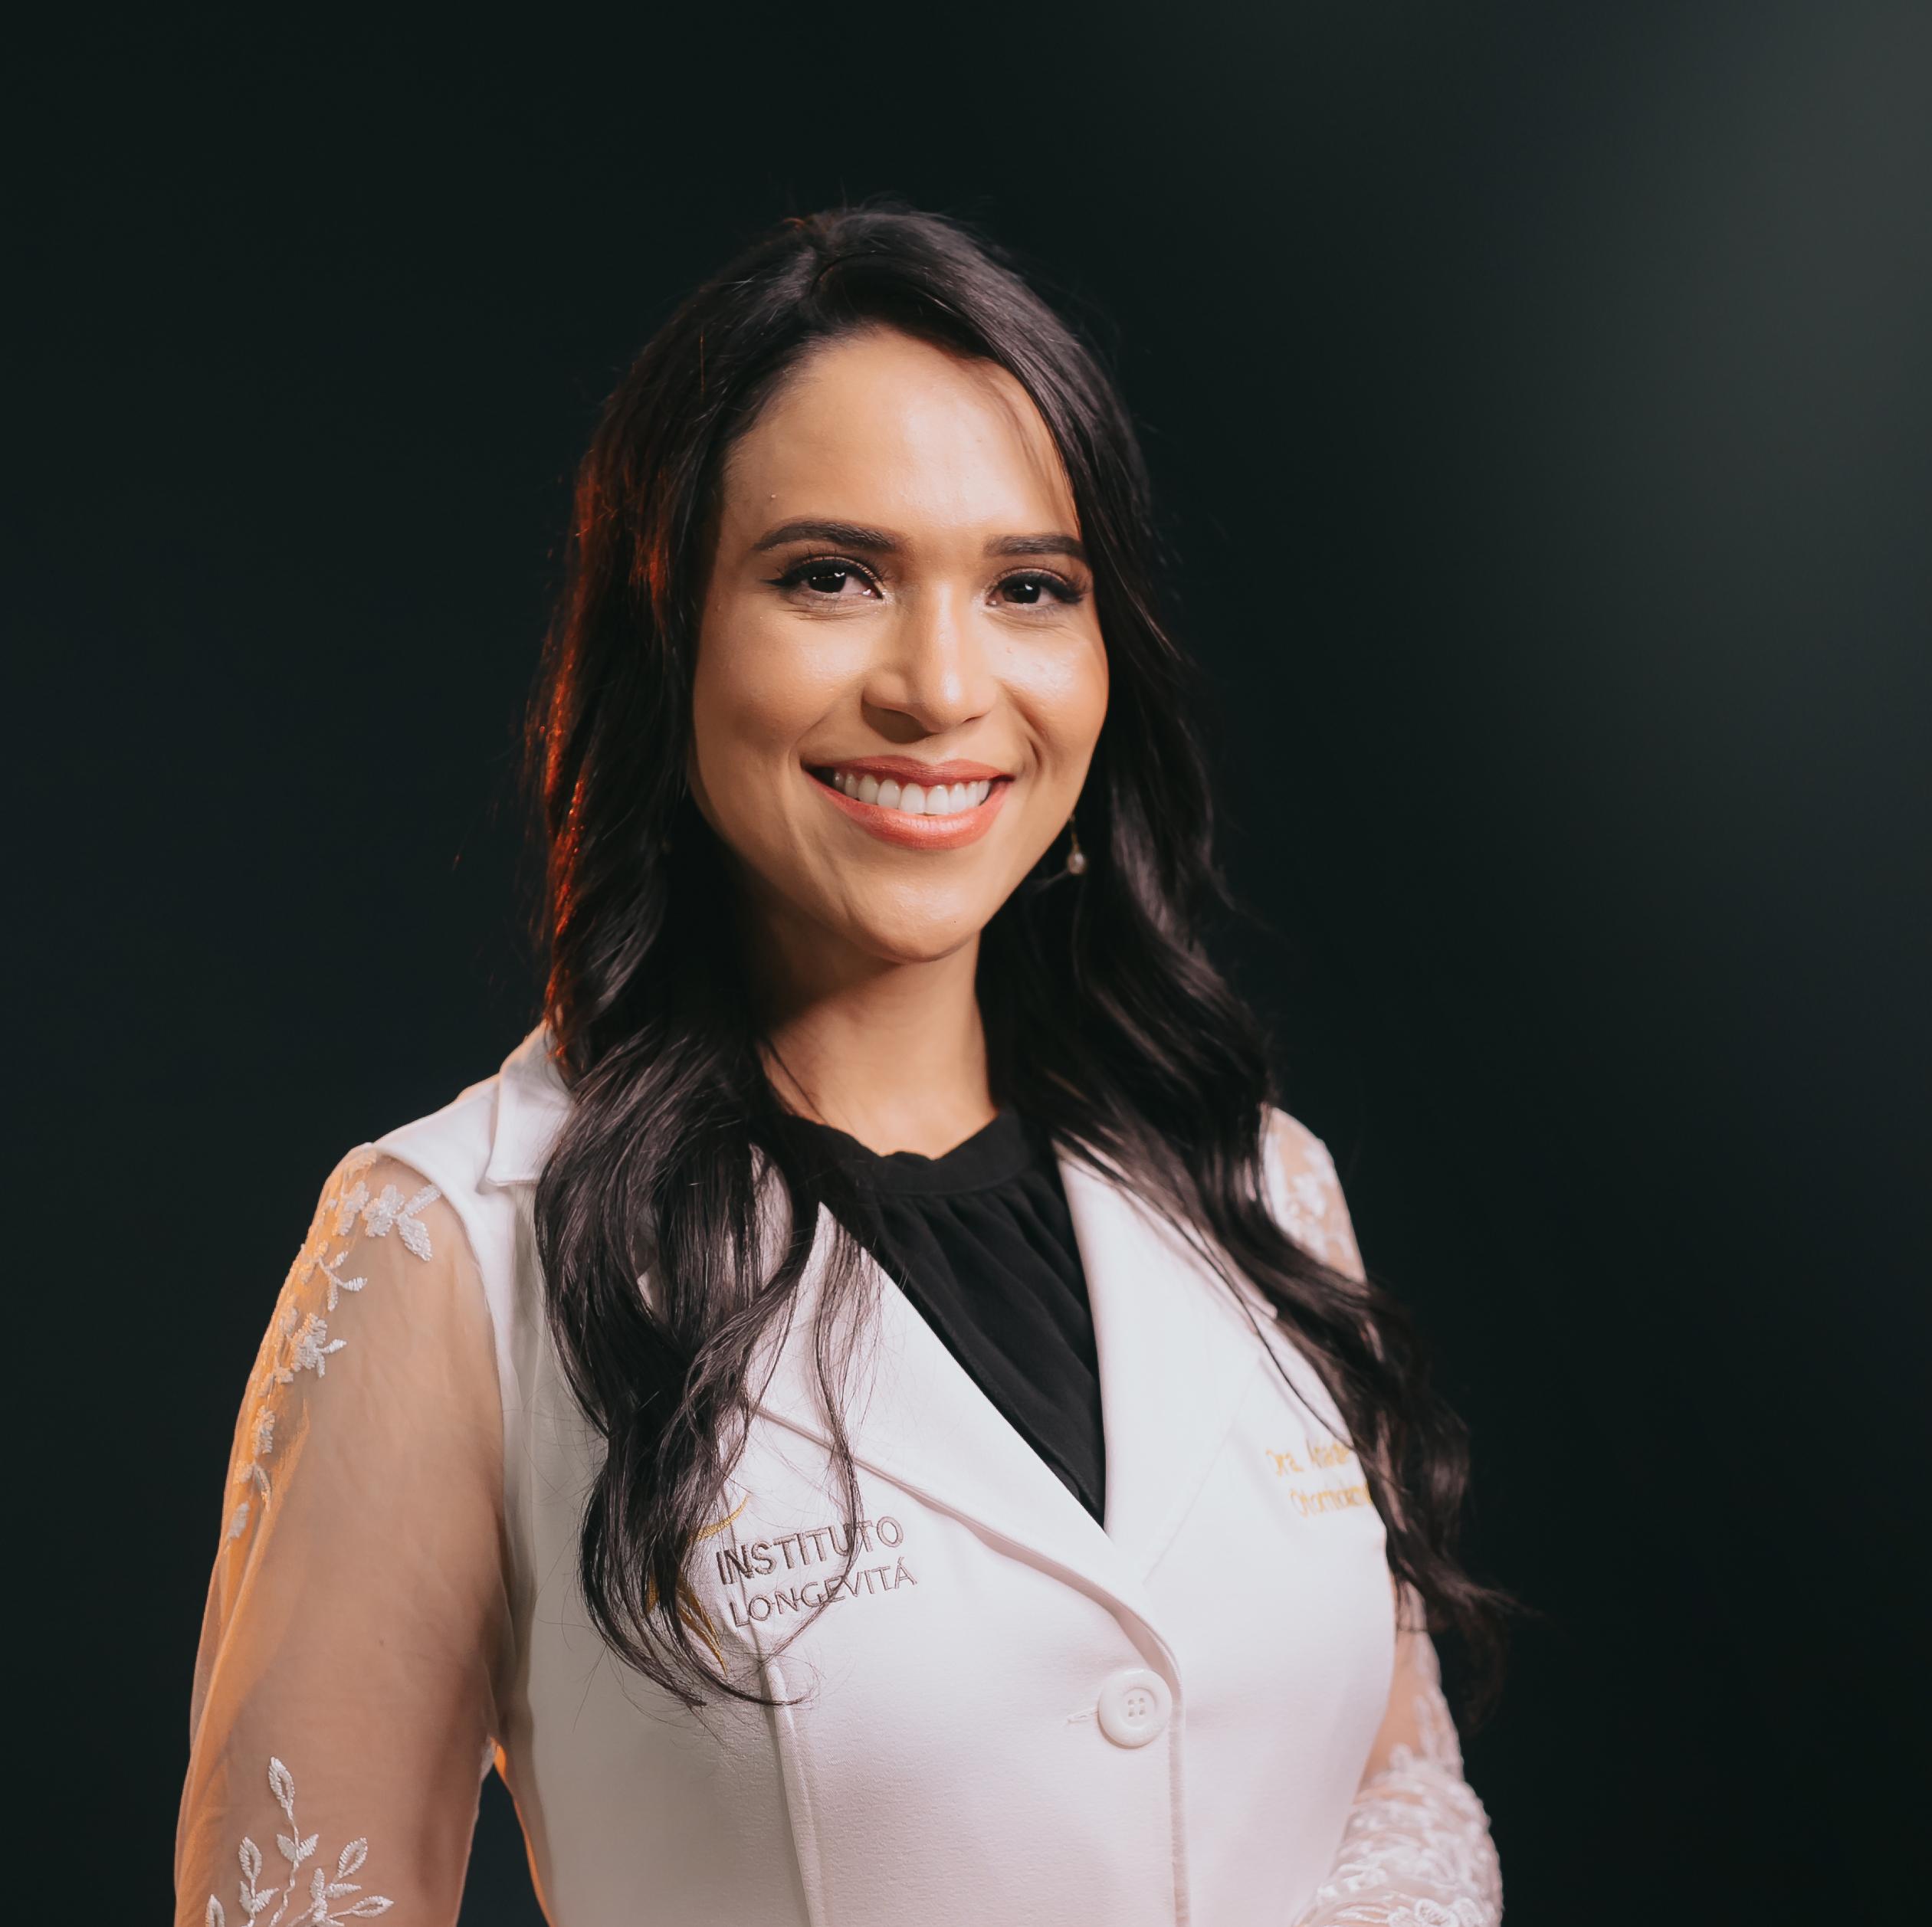 Ariadne Fonseca Carvalho Silva